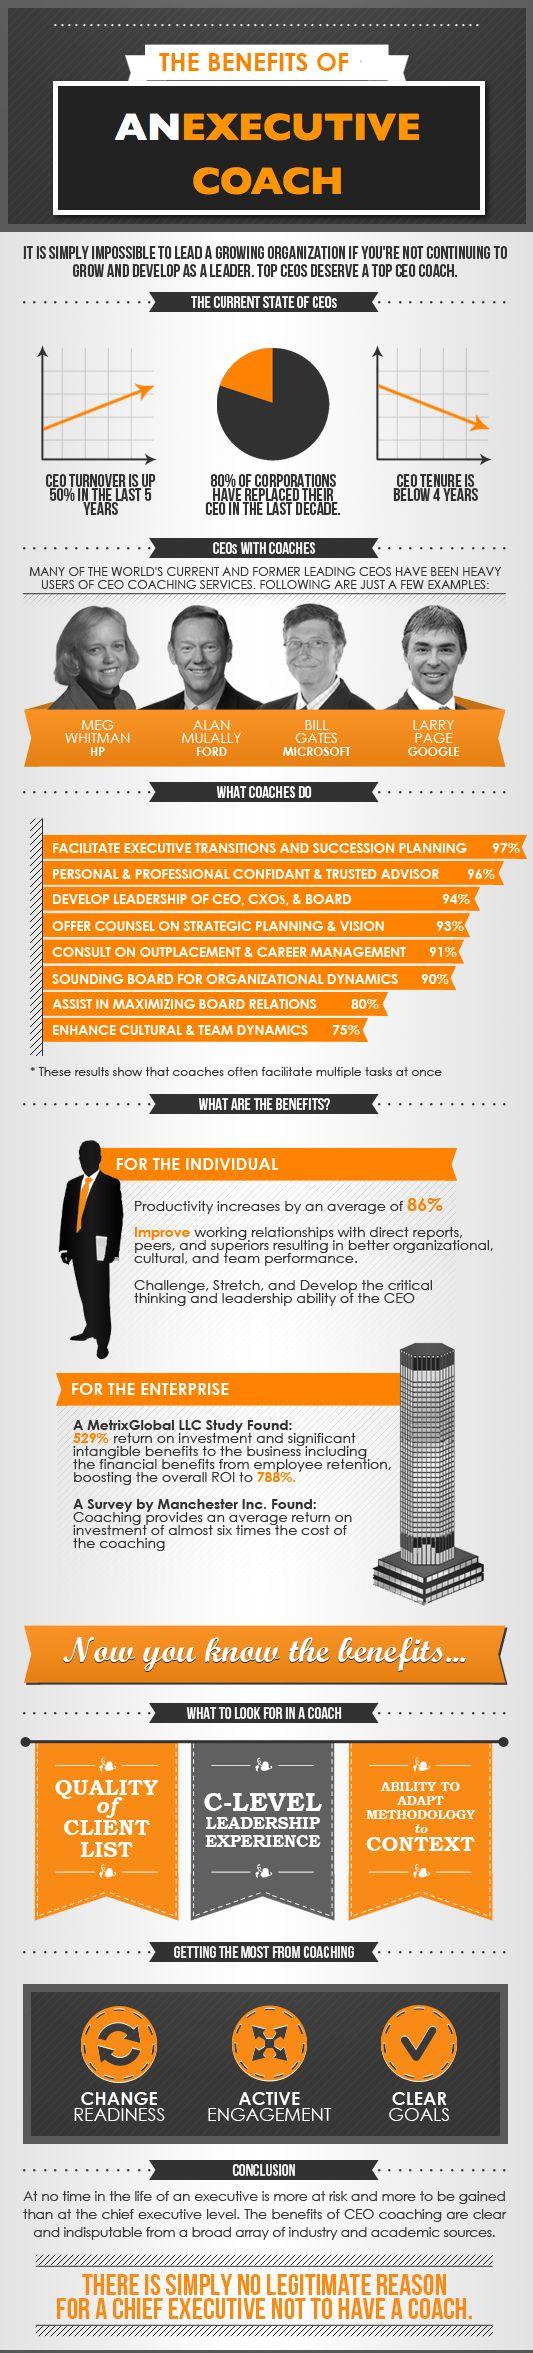 Why Executive Coaching? Association of Corporate Executive Coaches